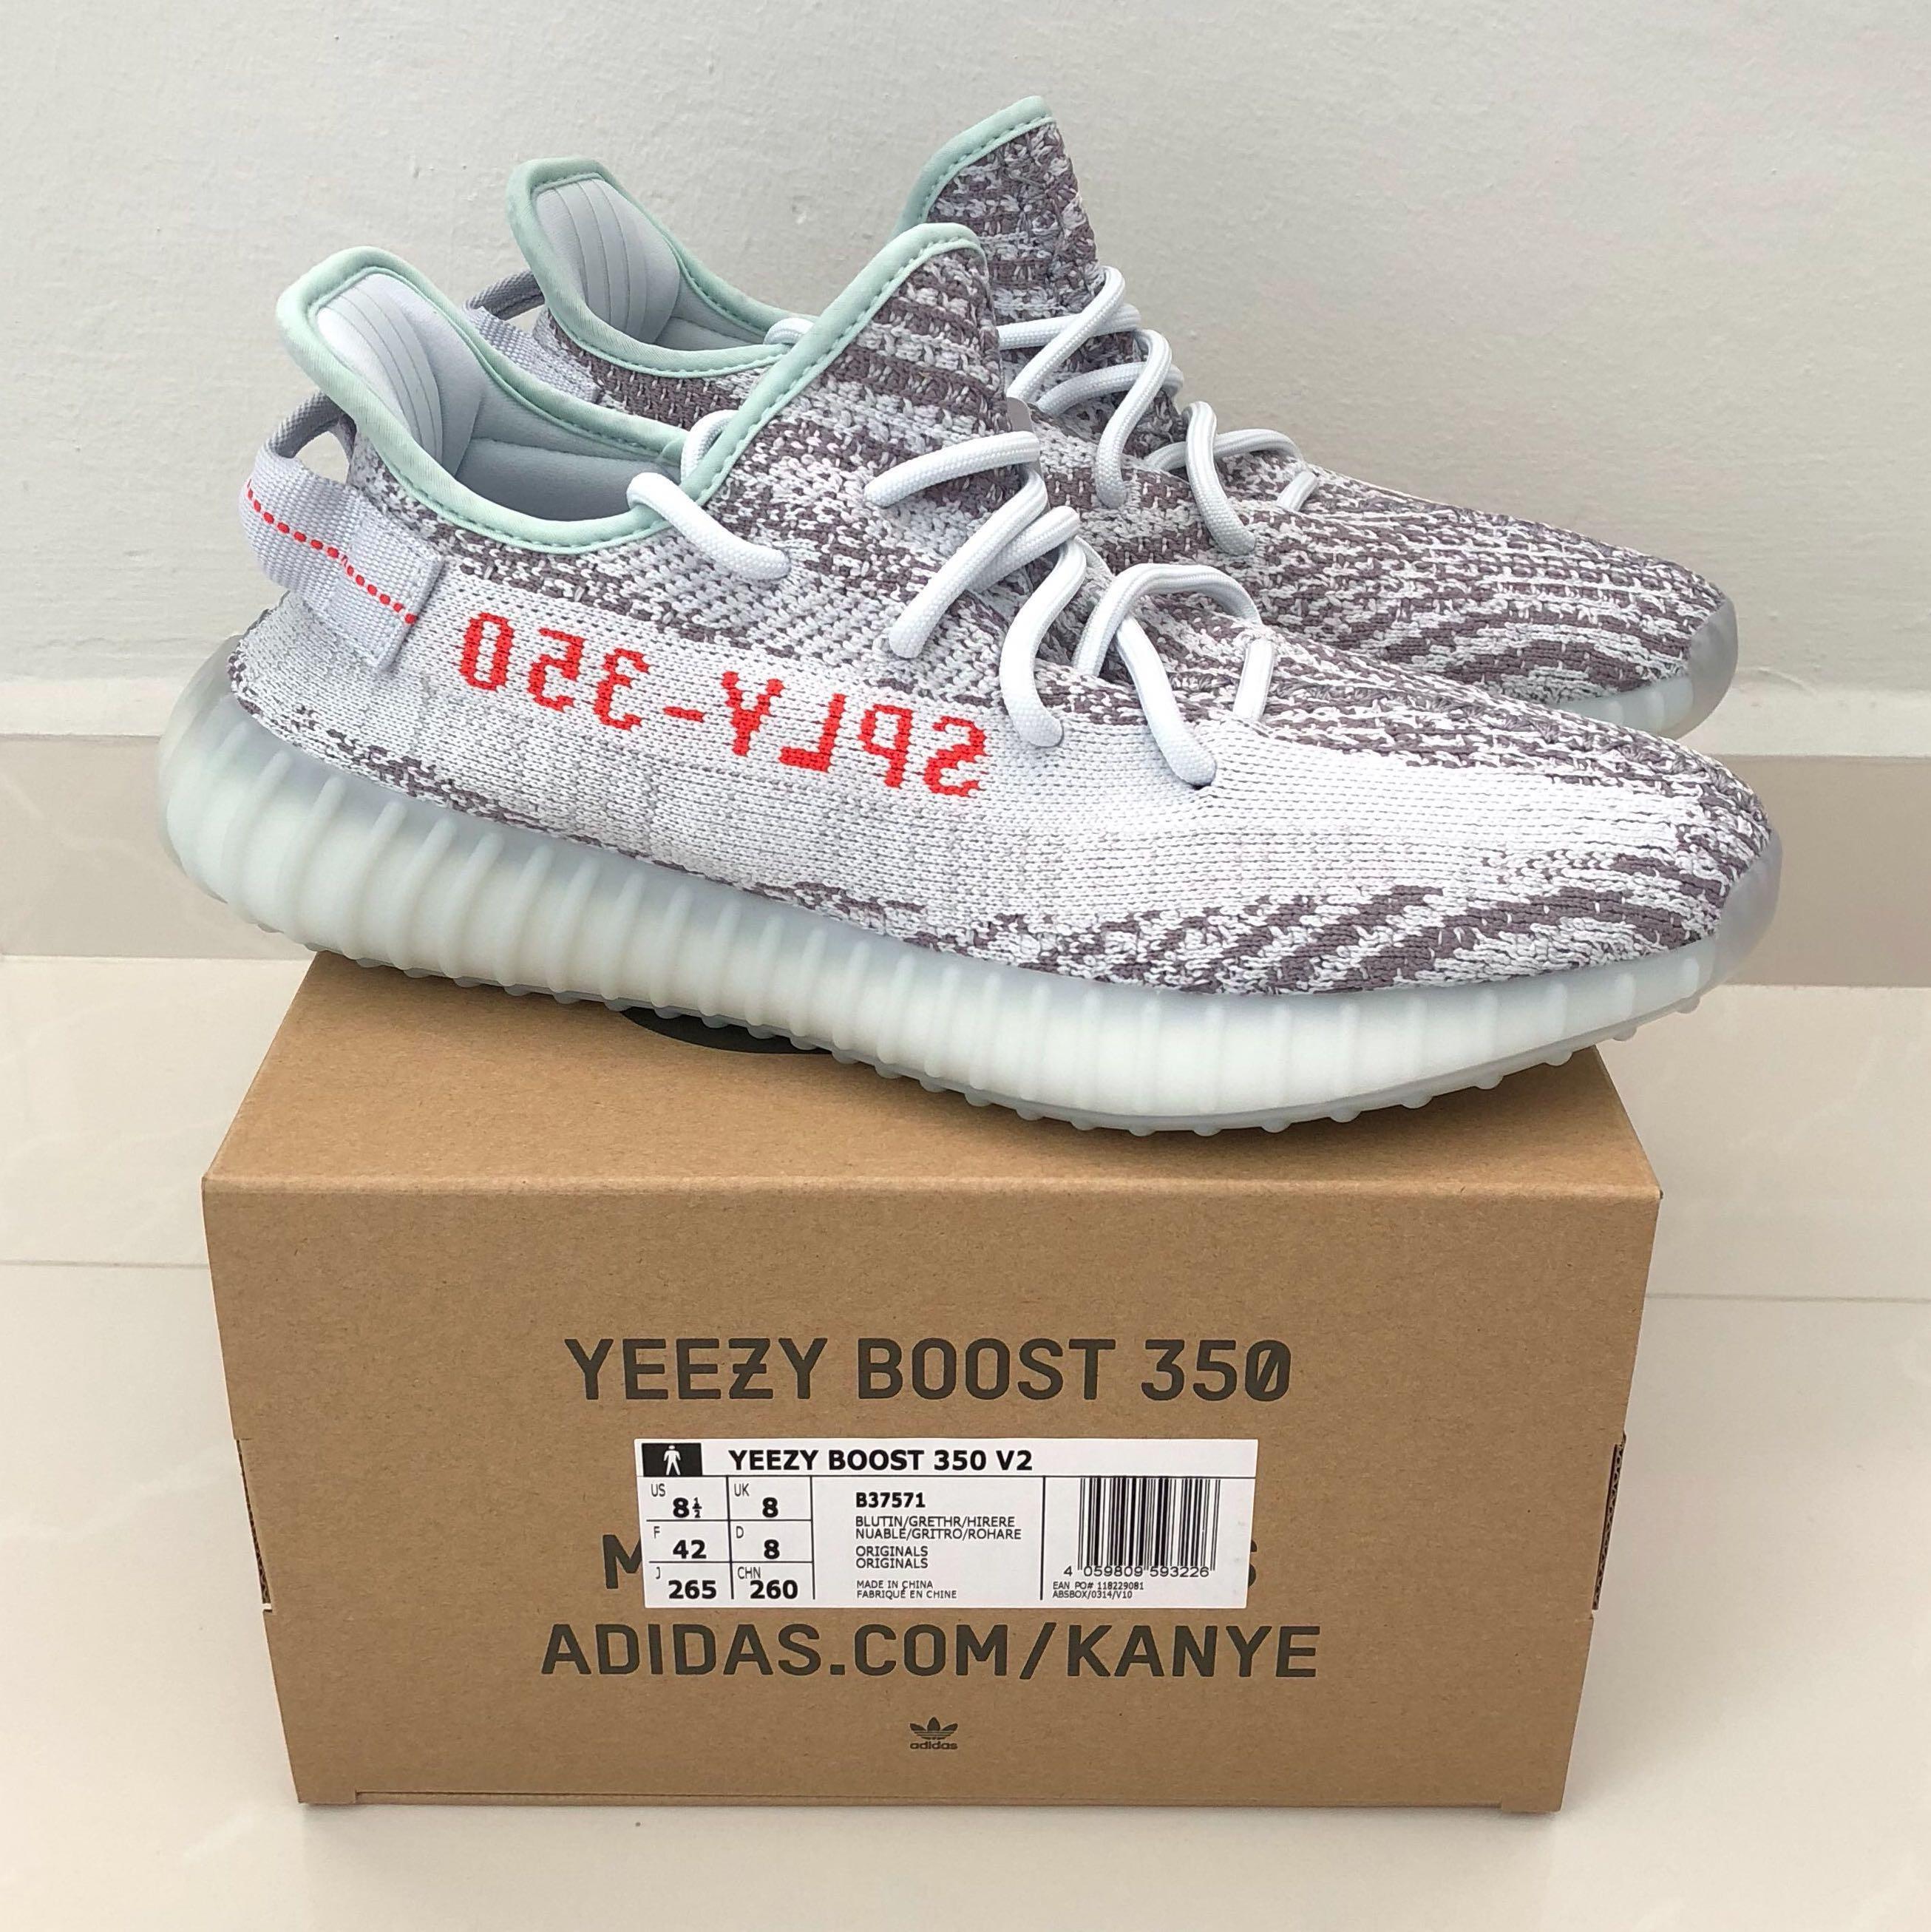 Adidas Yeezy Boost 350 V2 'Blue Tint